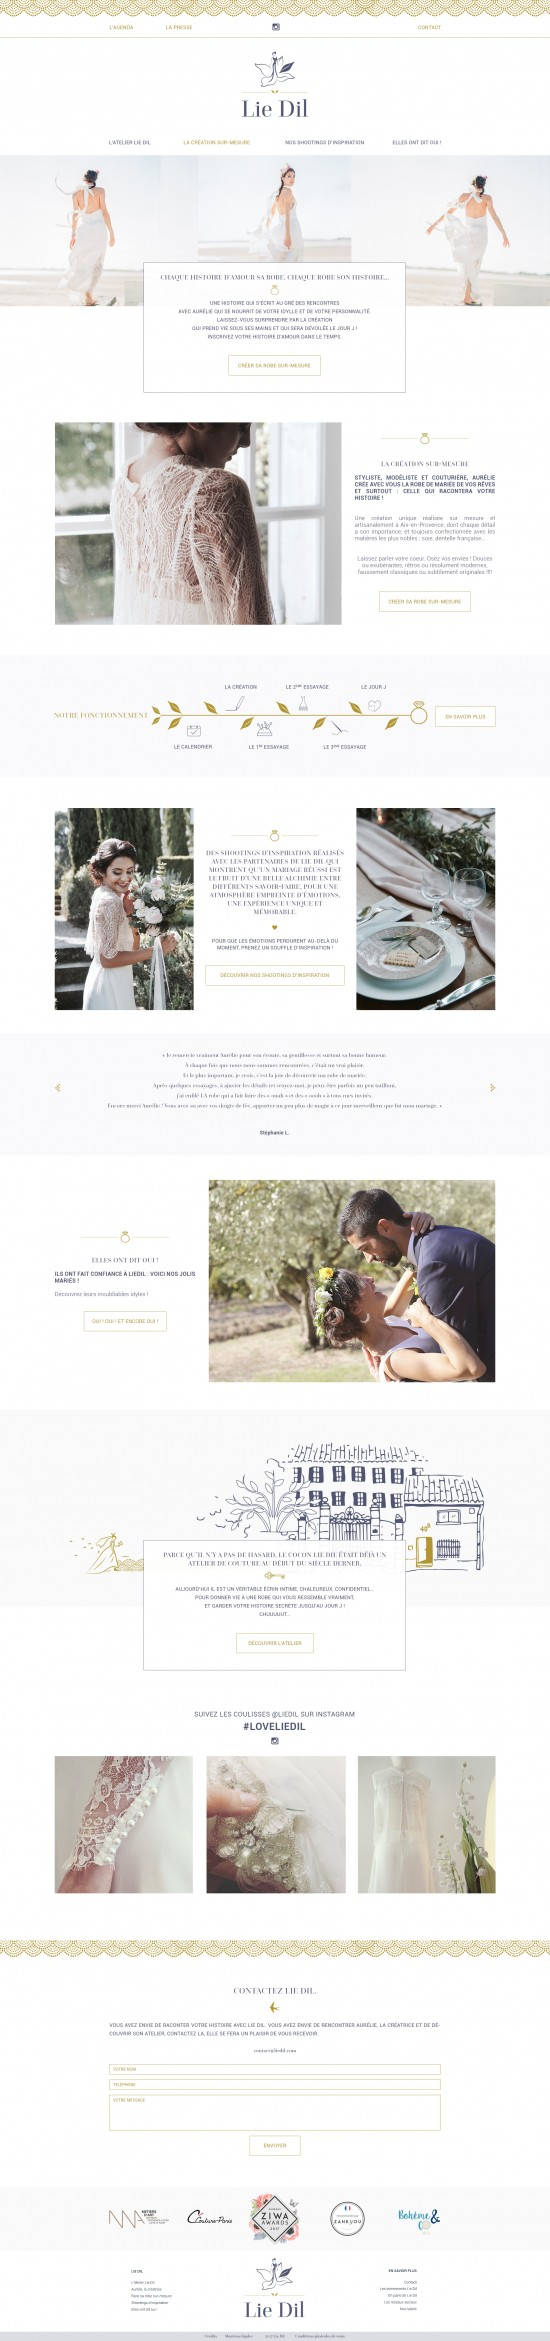 webdesign-homepage-lie-dil